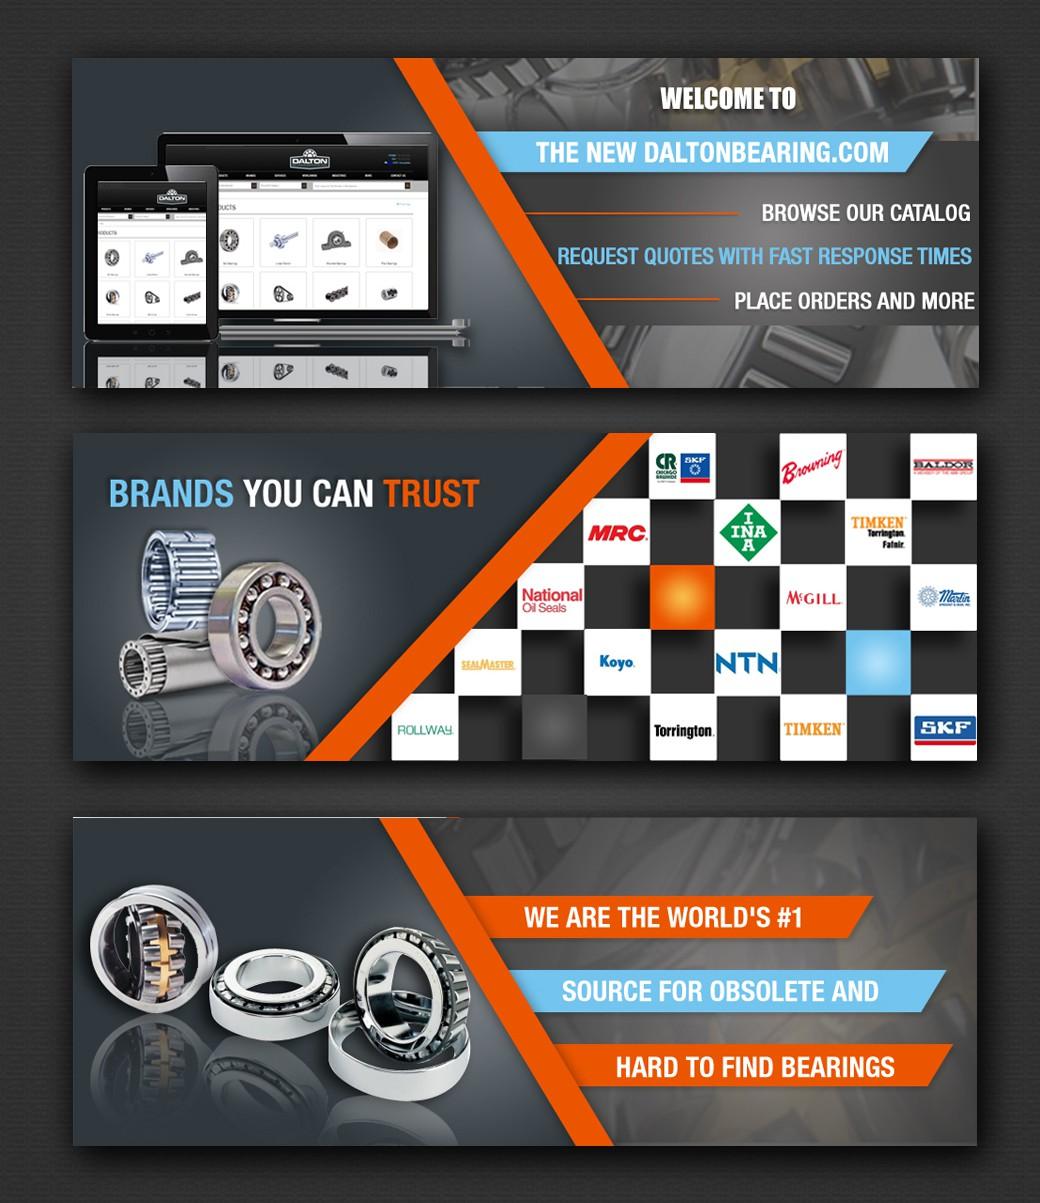 Slider graphics for new website's homepage